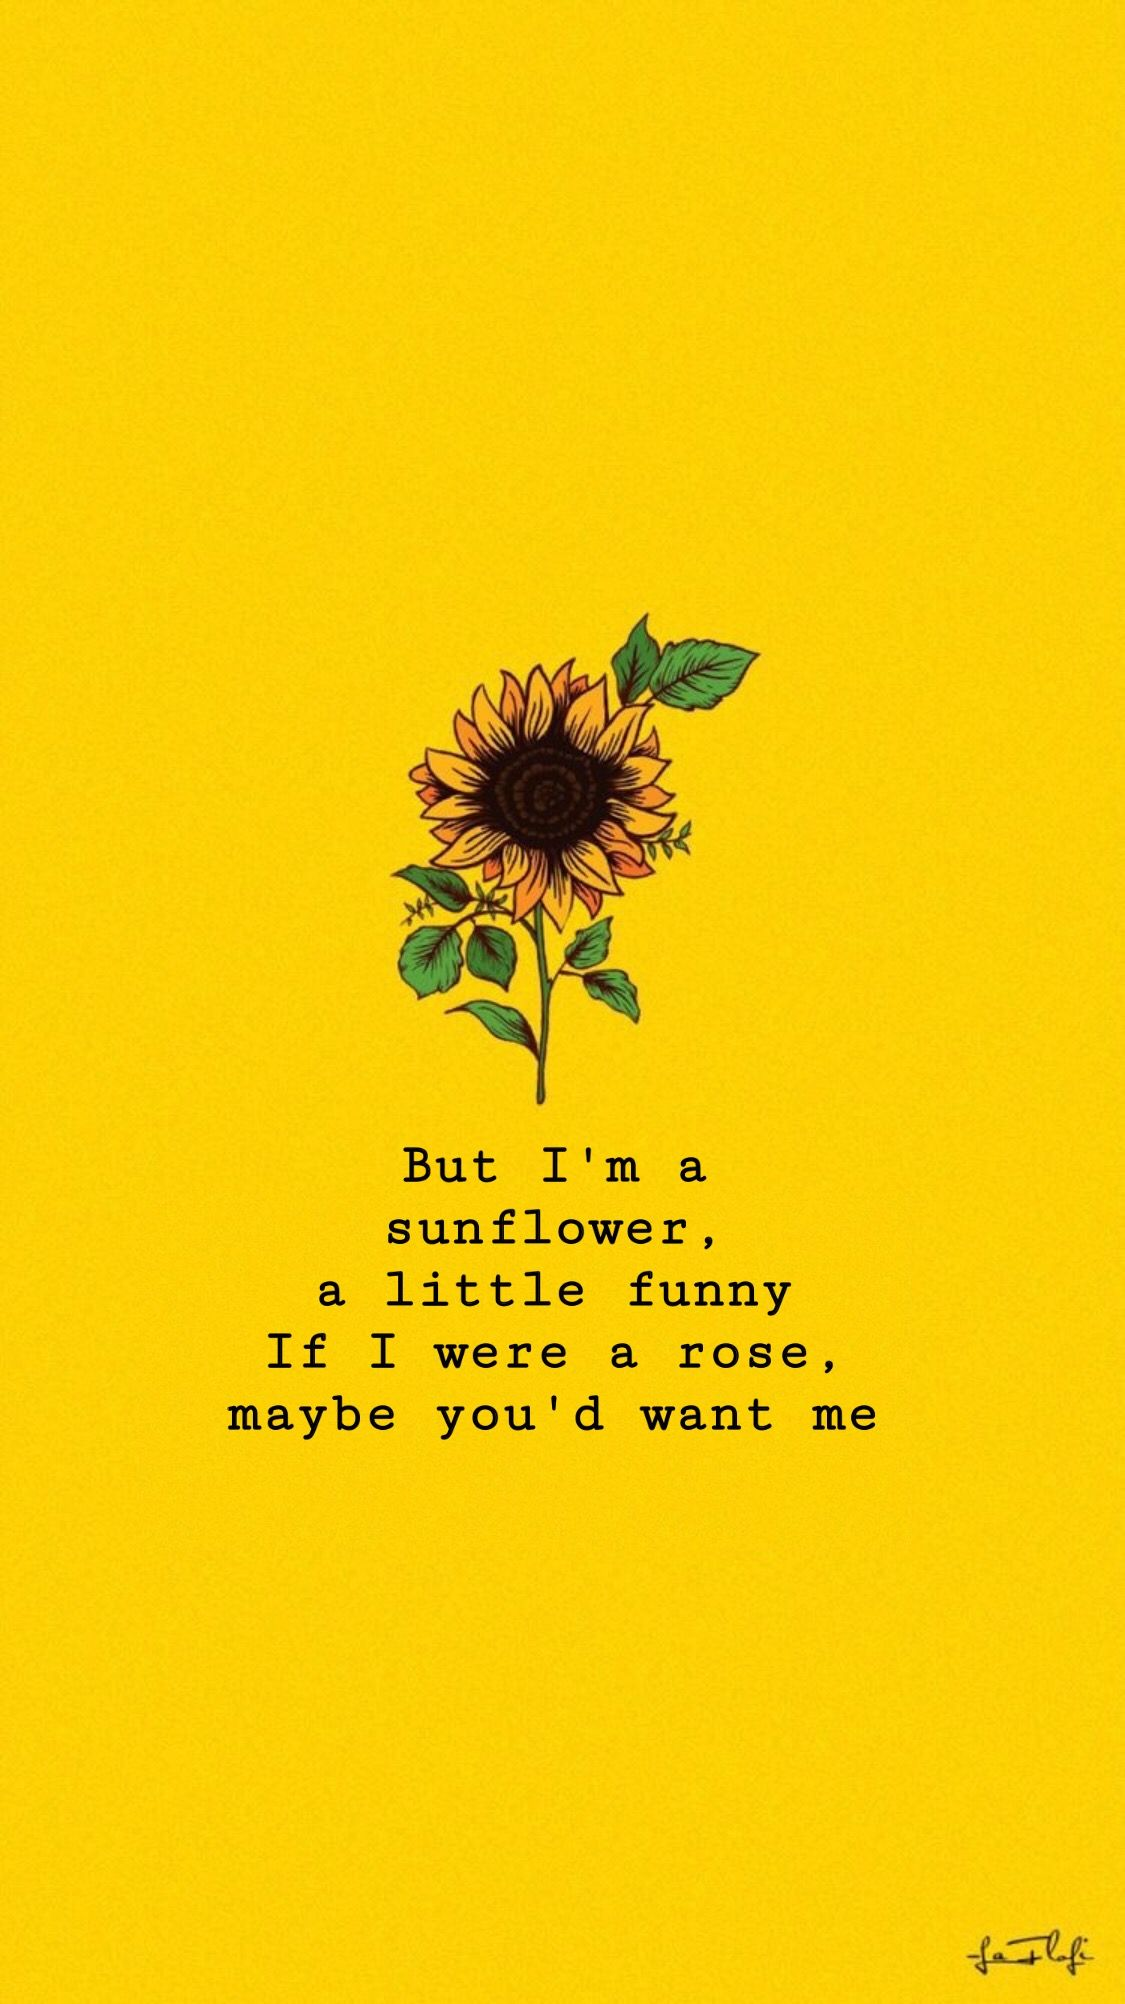 Sunflowers Sierraburgessisaloser Wallpaper Sunflower Quotes Wallpaper Quotes Sunflower Wallpaper